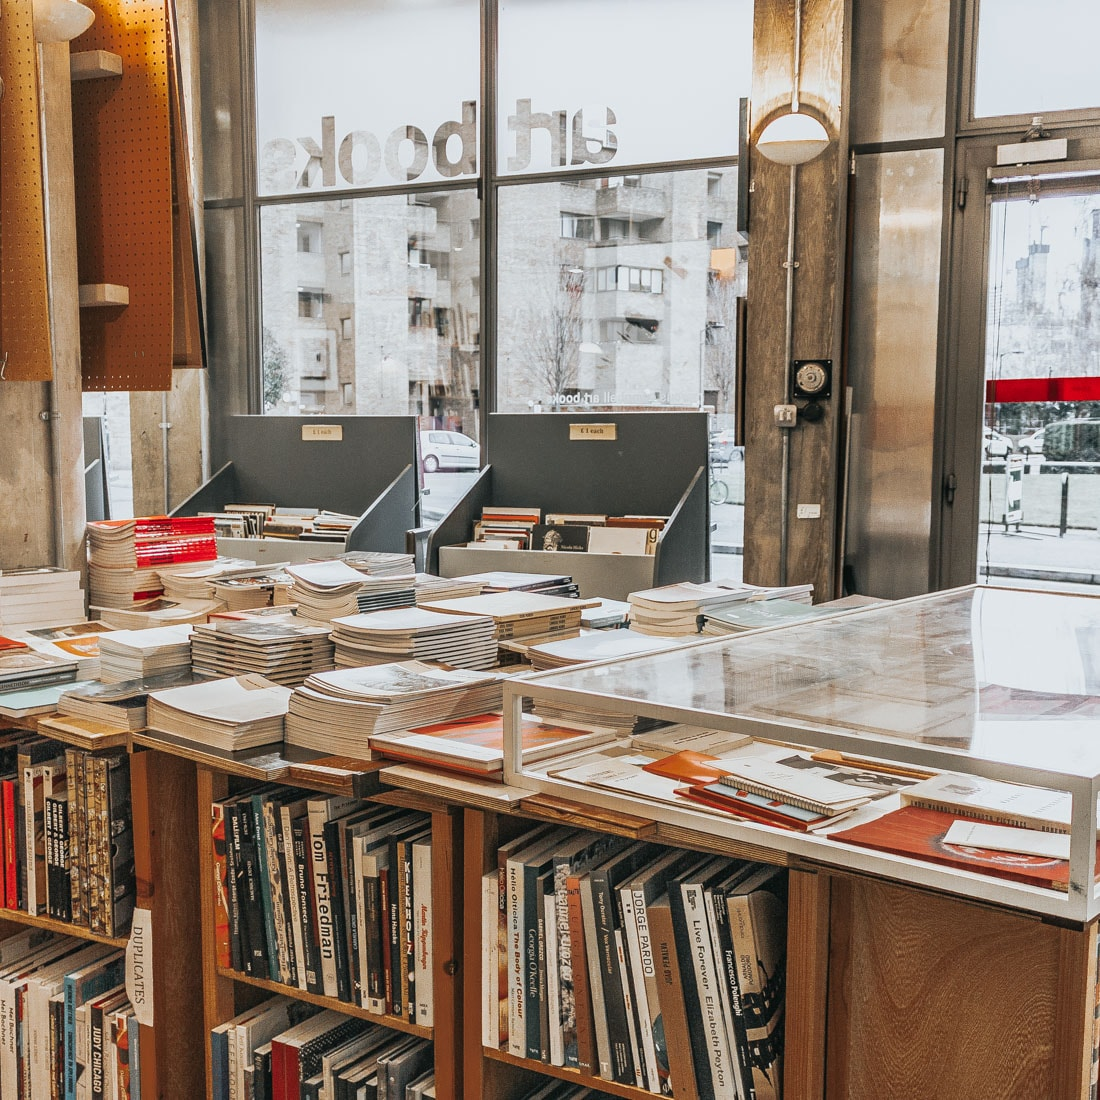 MARCUS CAMPBELL, ART BOOK, LONDON